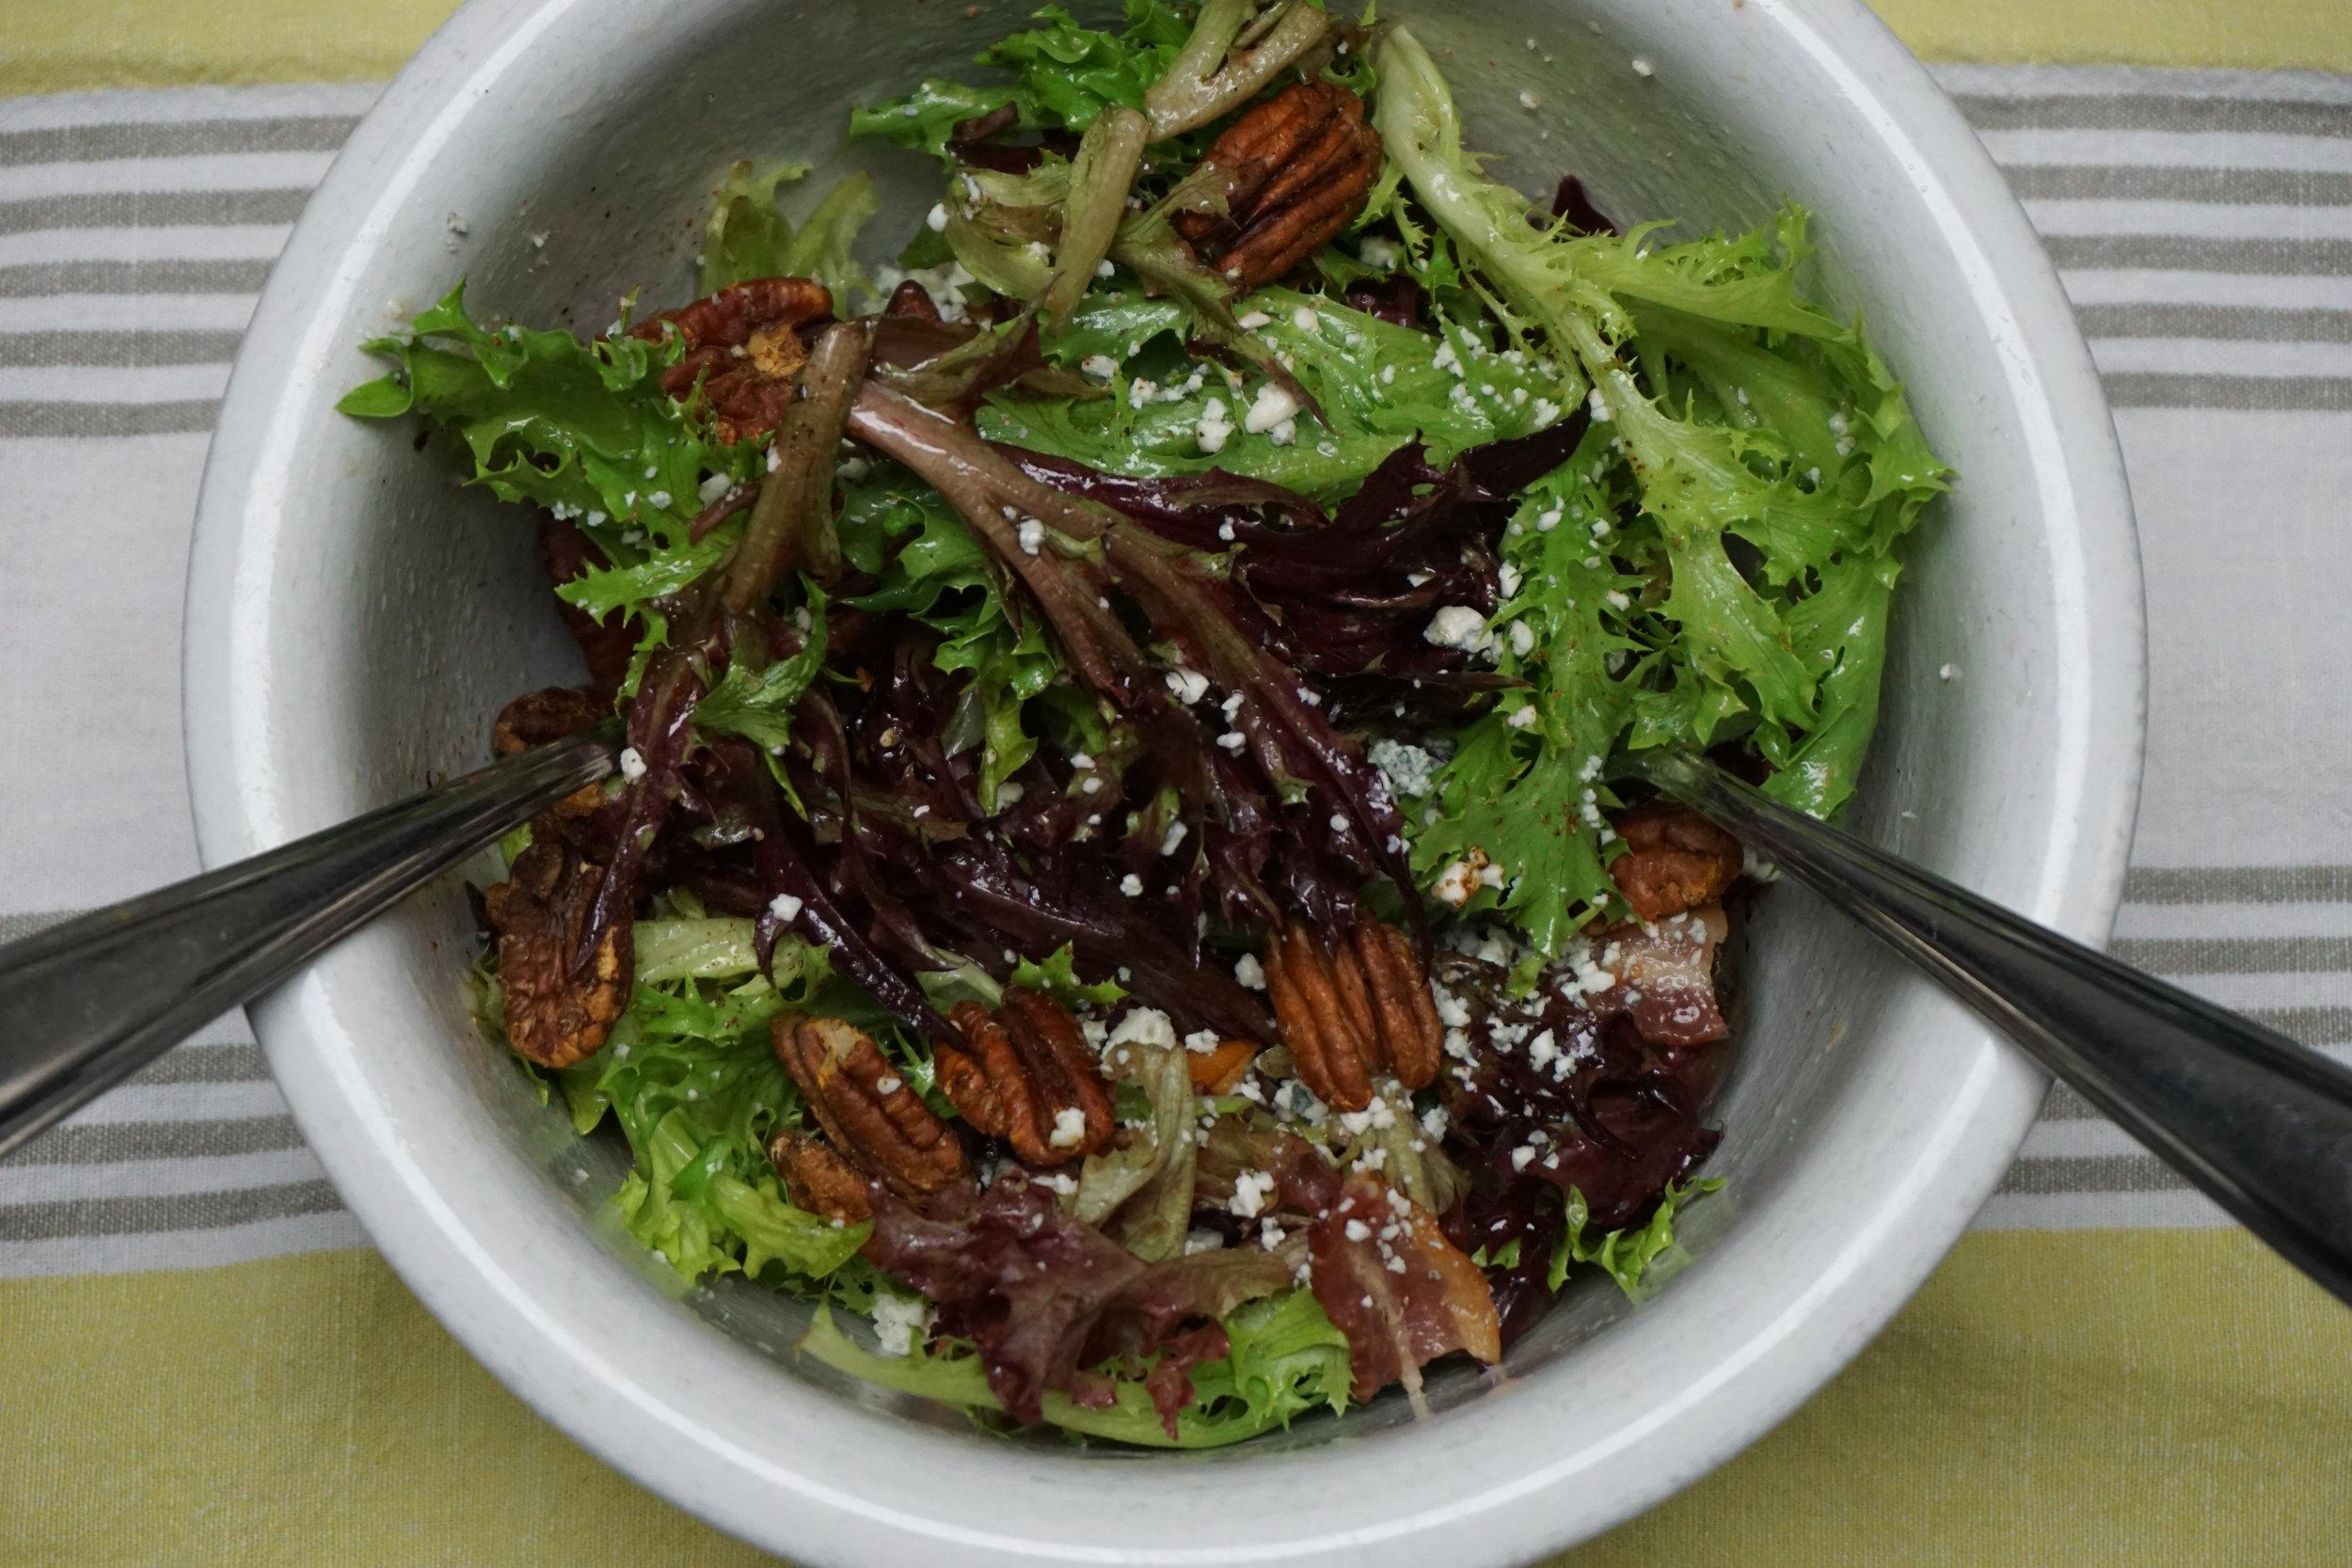 Spiced Pecan Salad